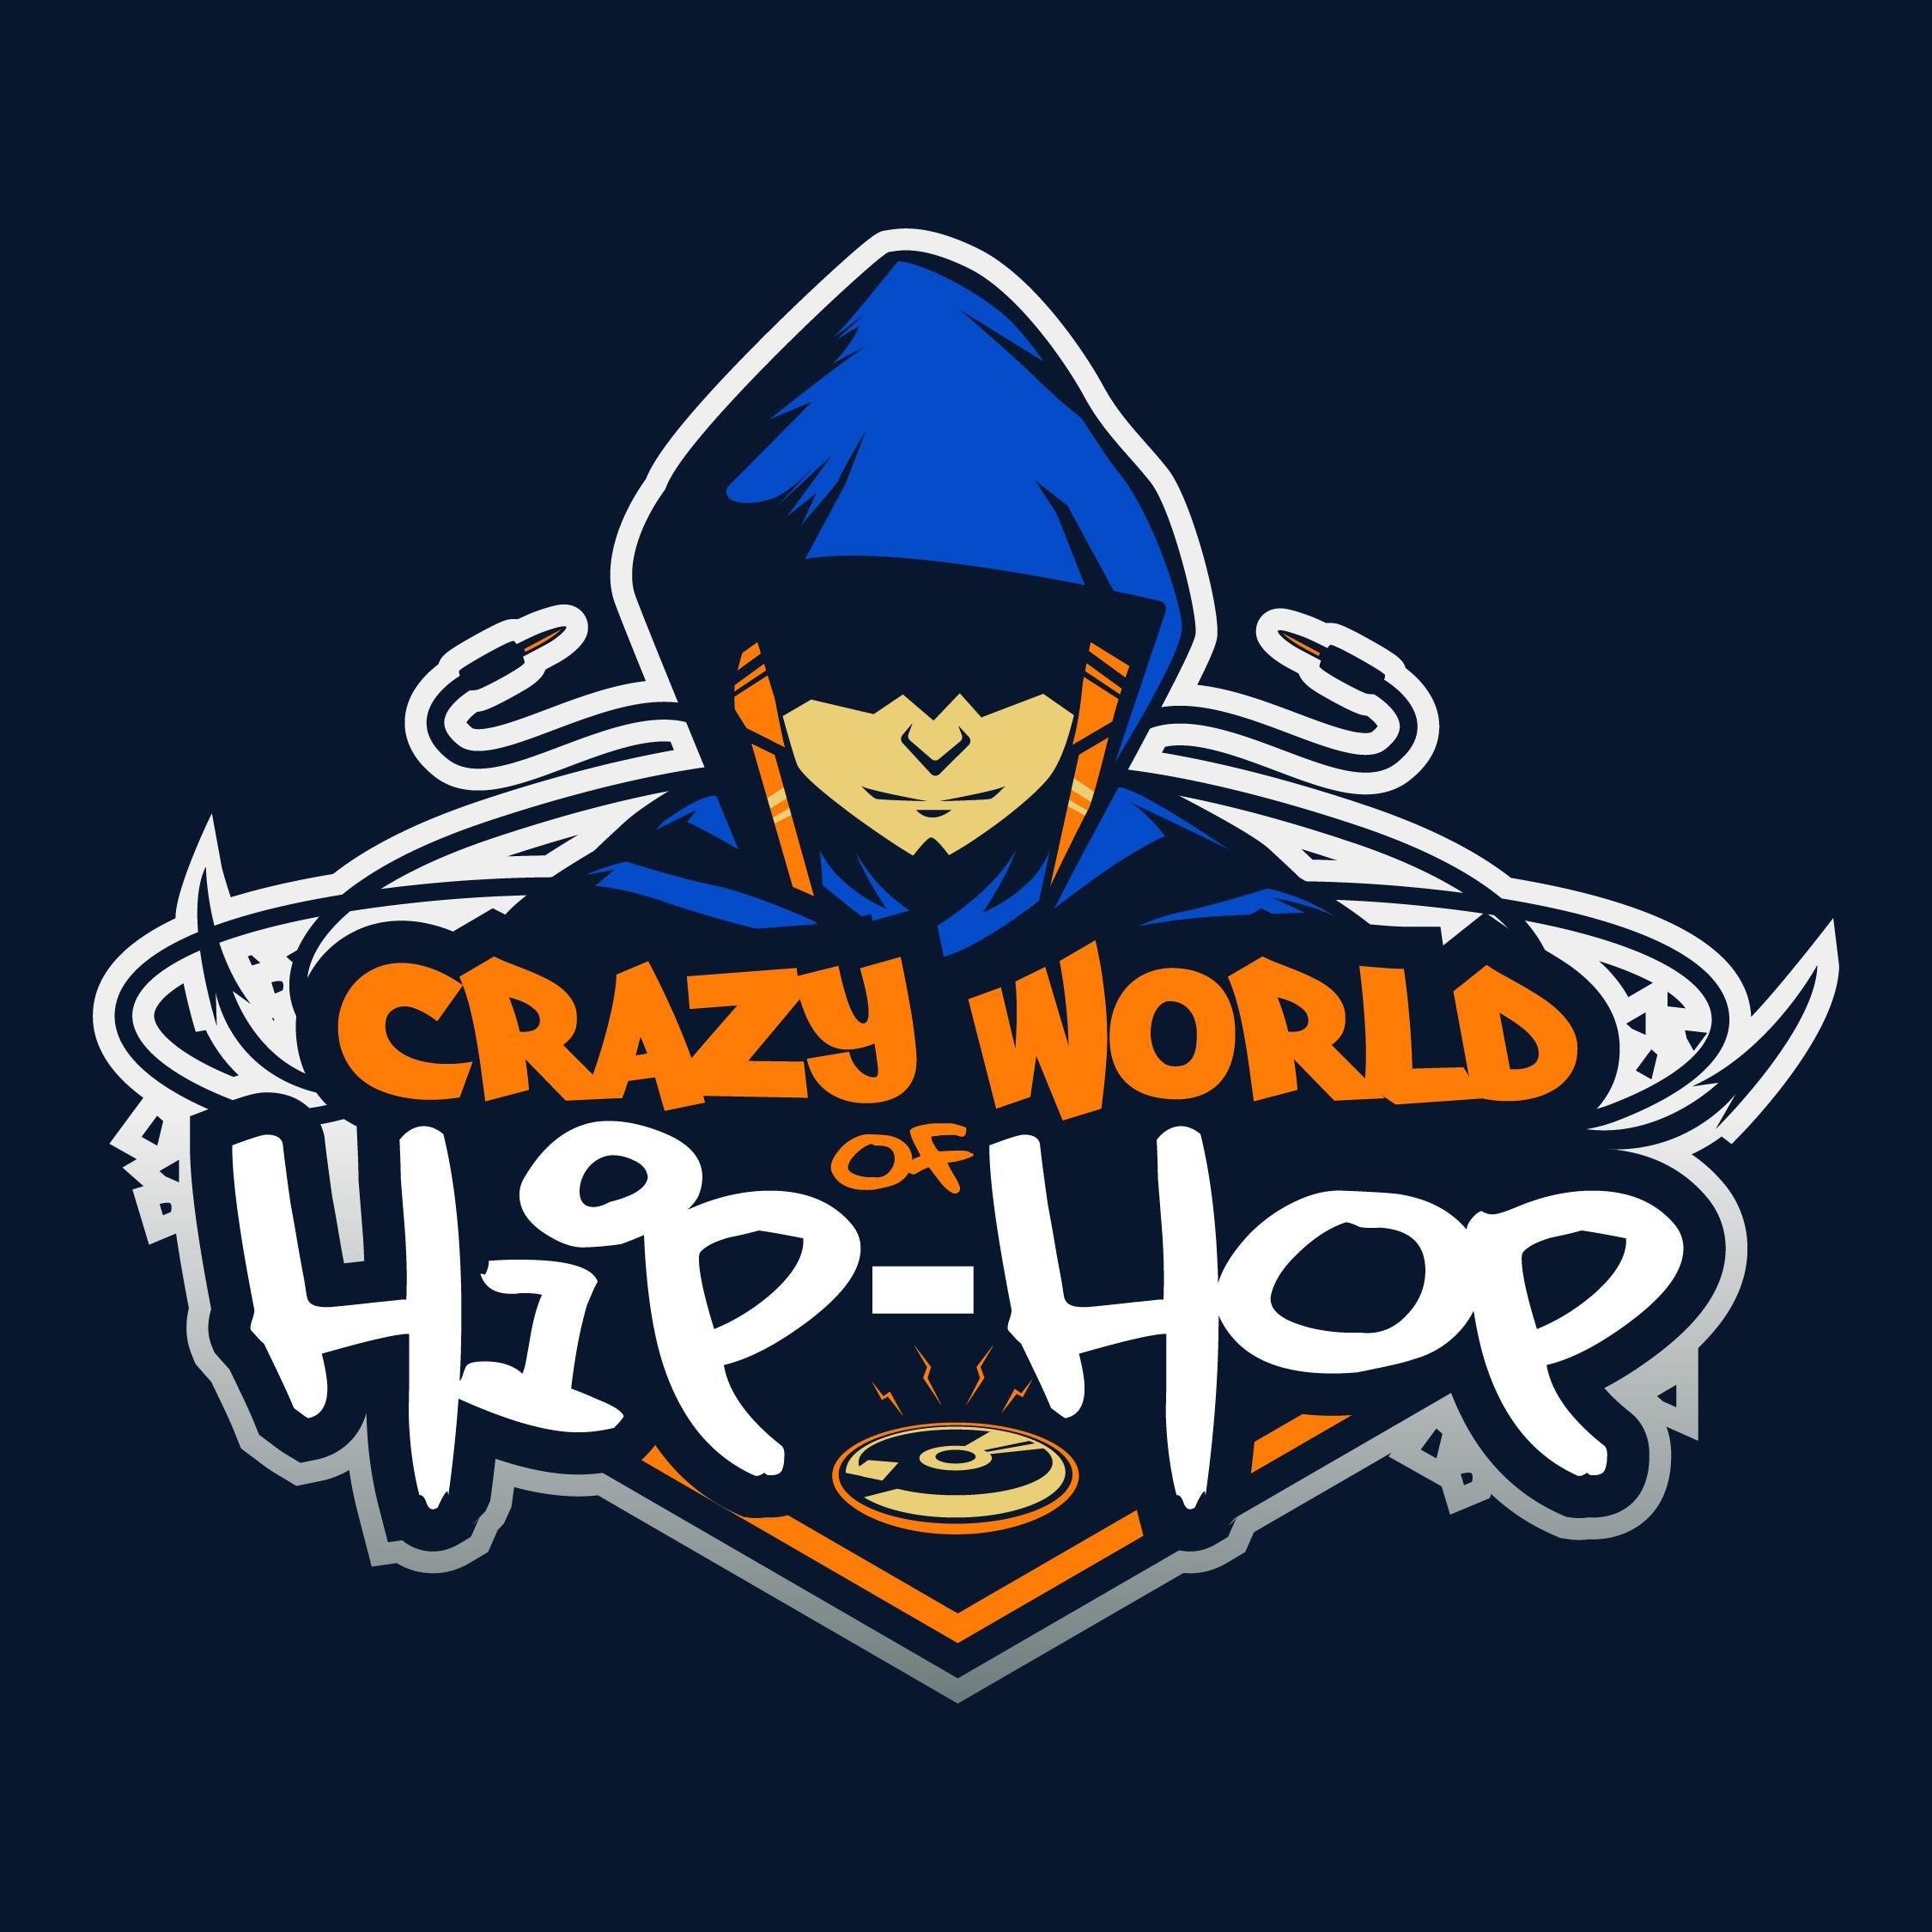 Crazy World of Hip-Hop talk show needs logo for merch & branding